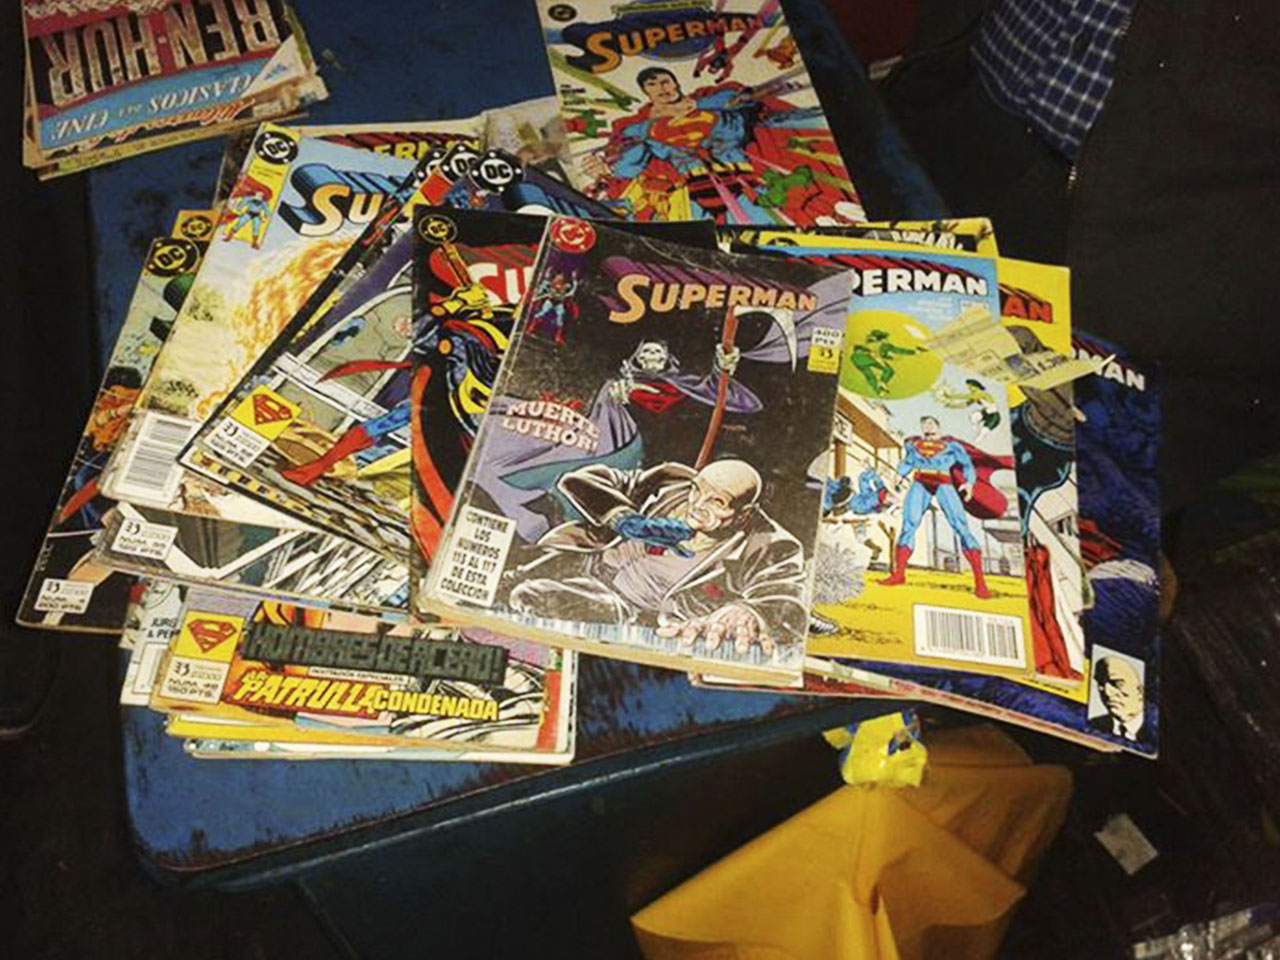 """Superman"" en Terra Comic podrás encontrar diferentes historias de este superhéroe."